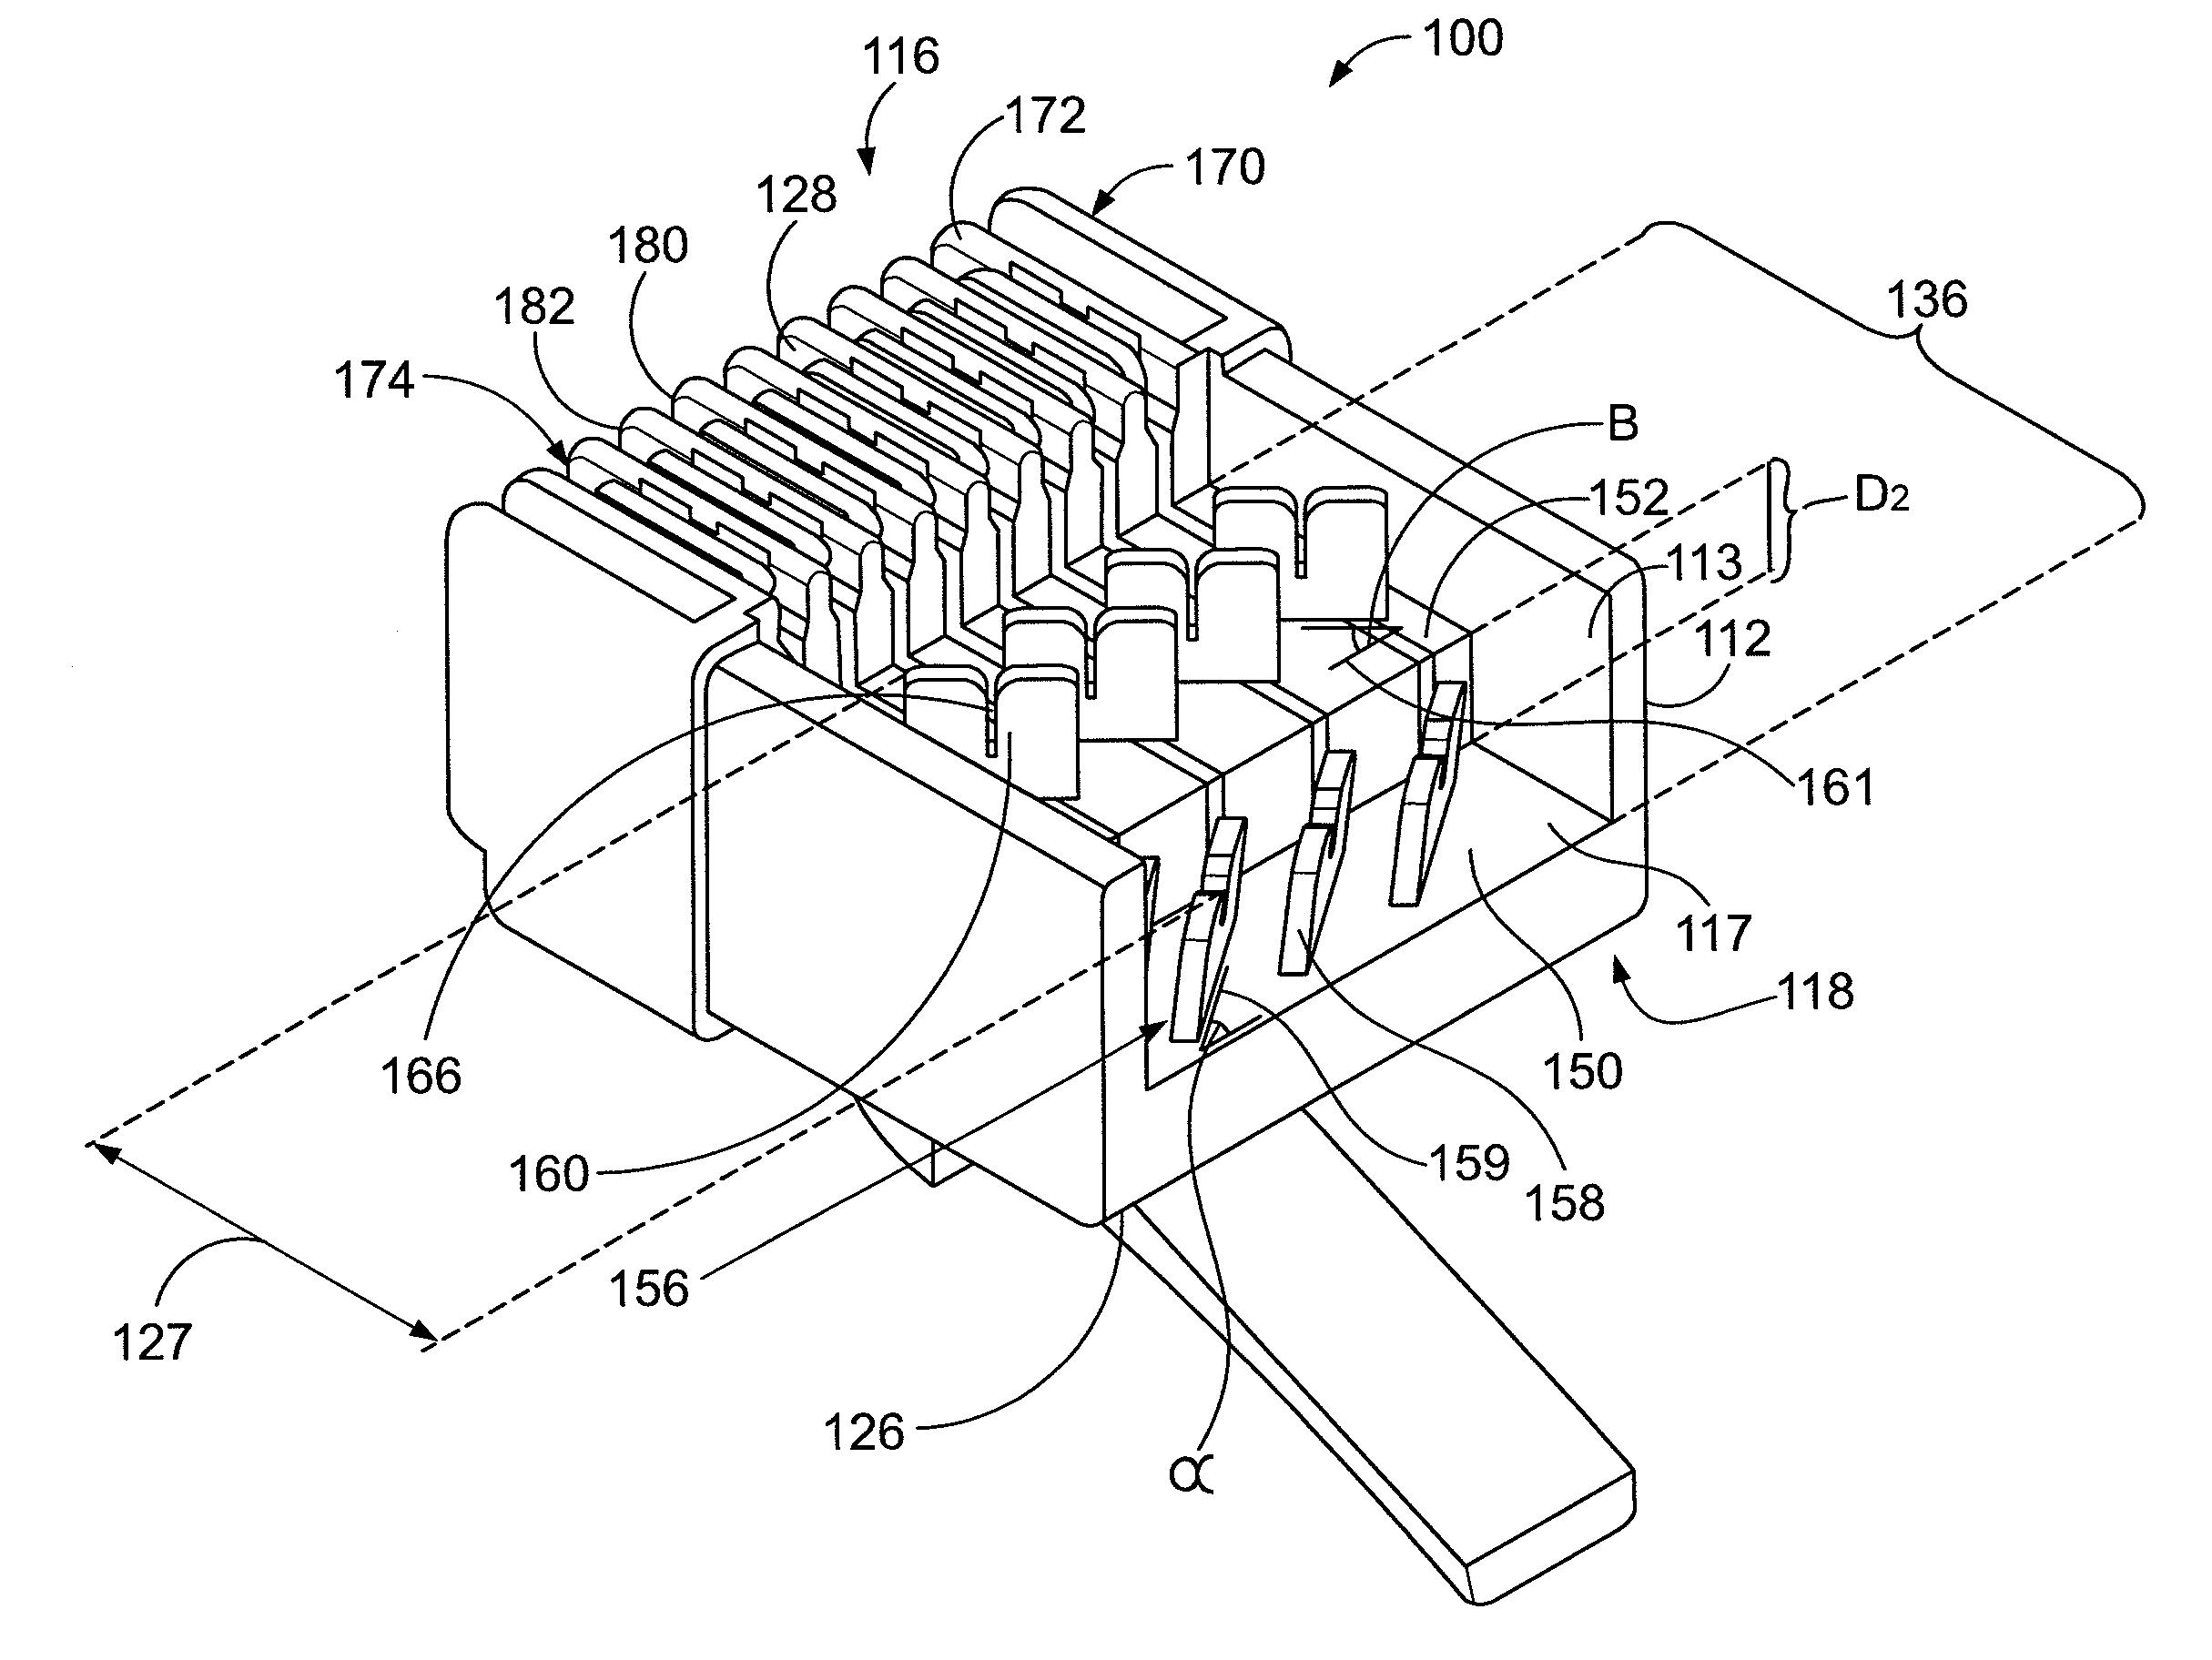 leviton 476tl t12 wiring diagram   32 wiring diagram